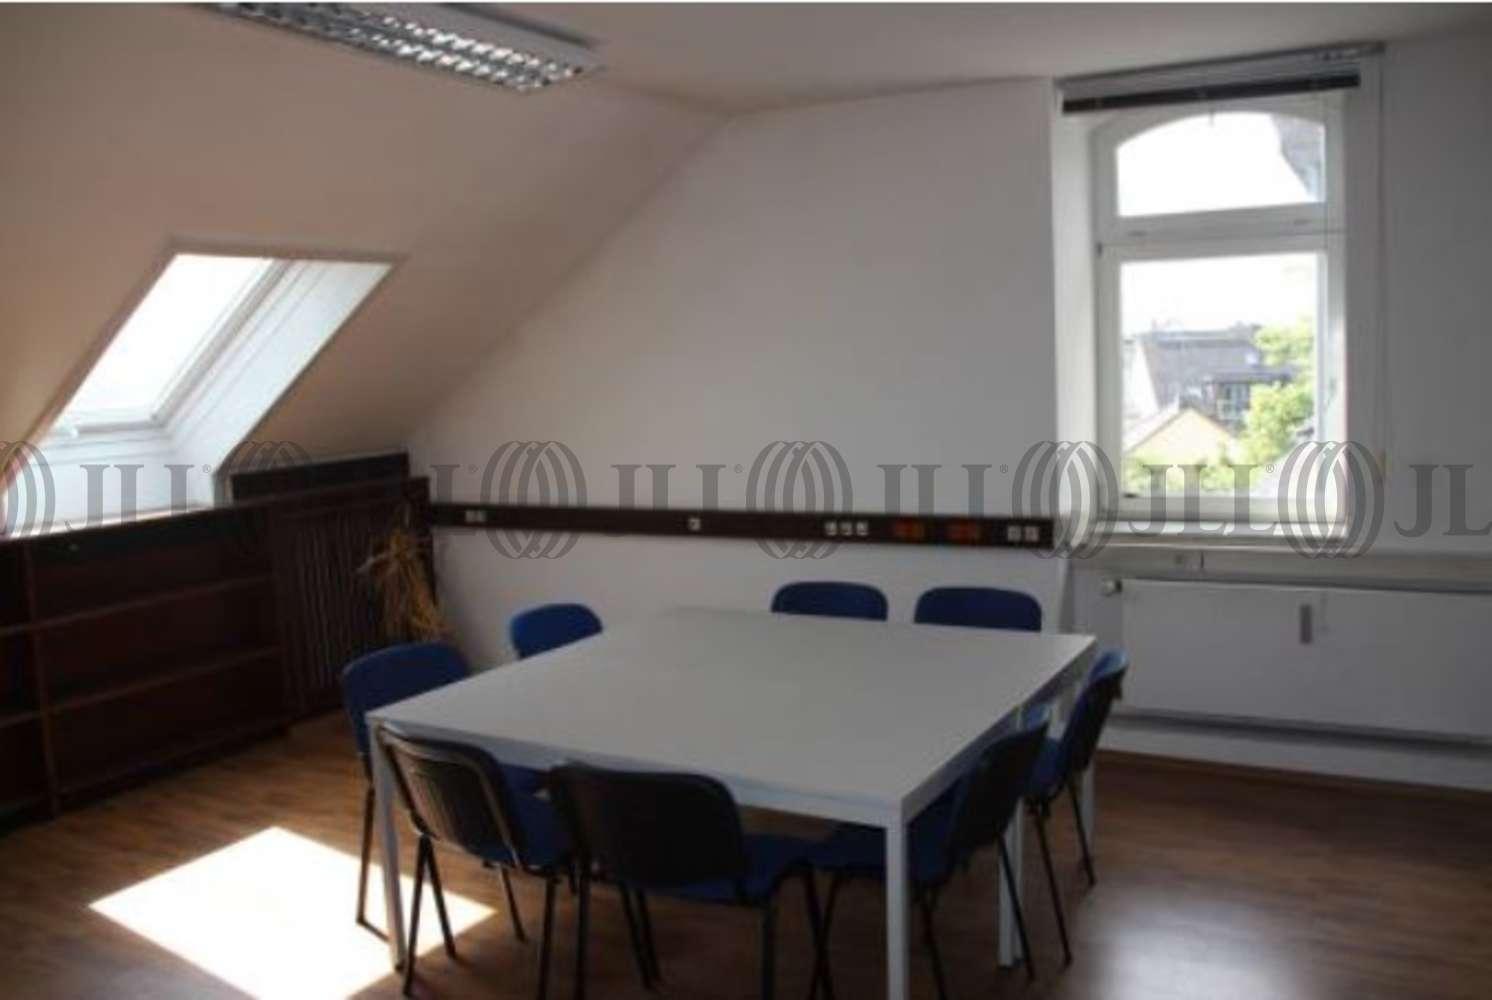 Büros Troisdorf, 53842 - Büro - Troisdorf, Oberlar - K0805 - 9406962